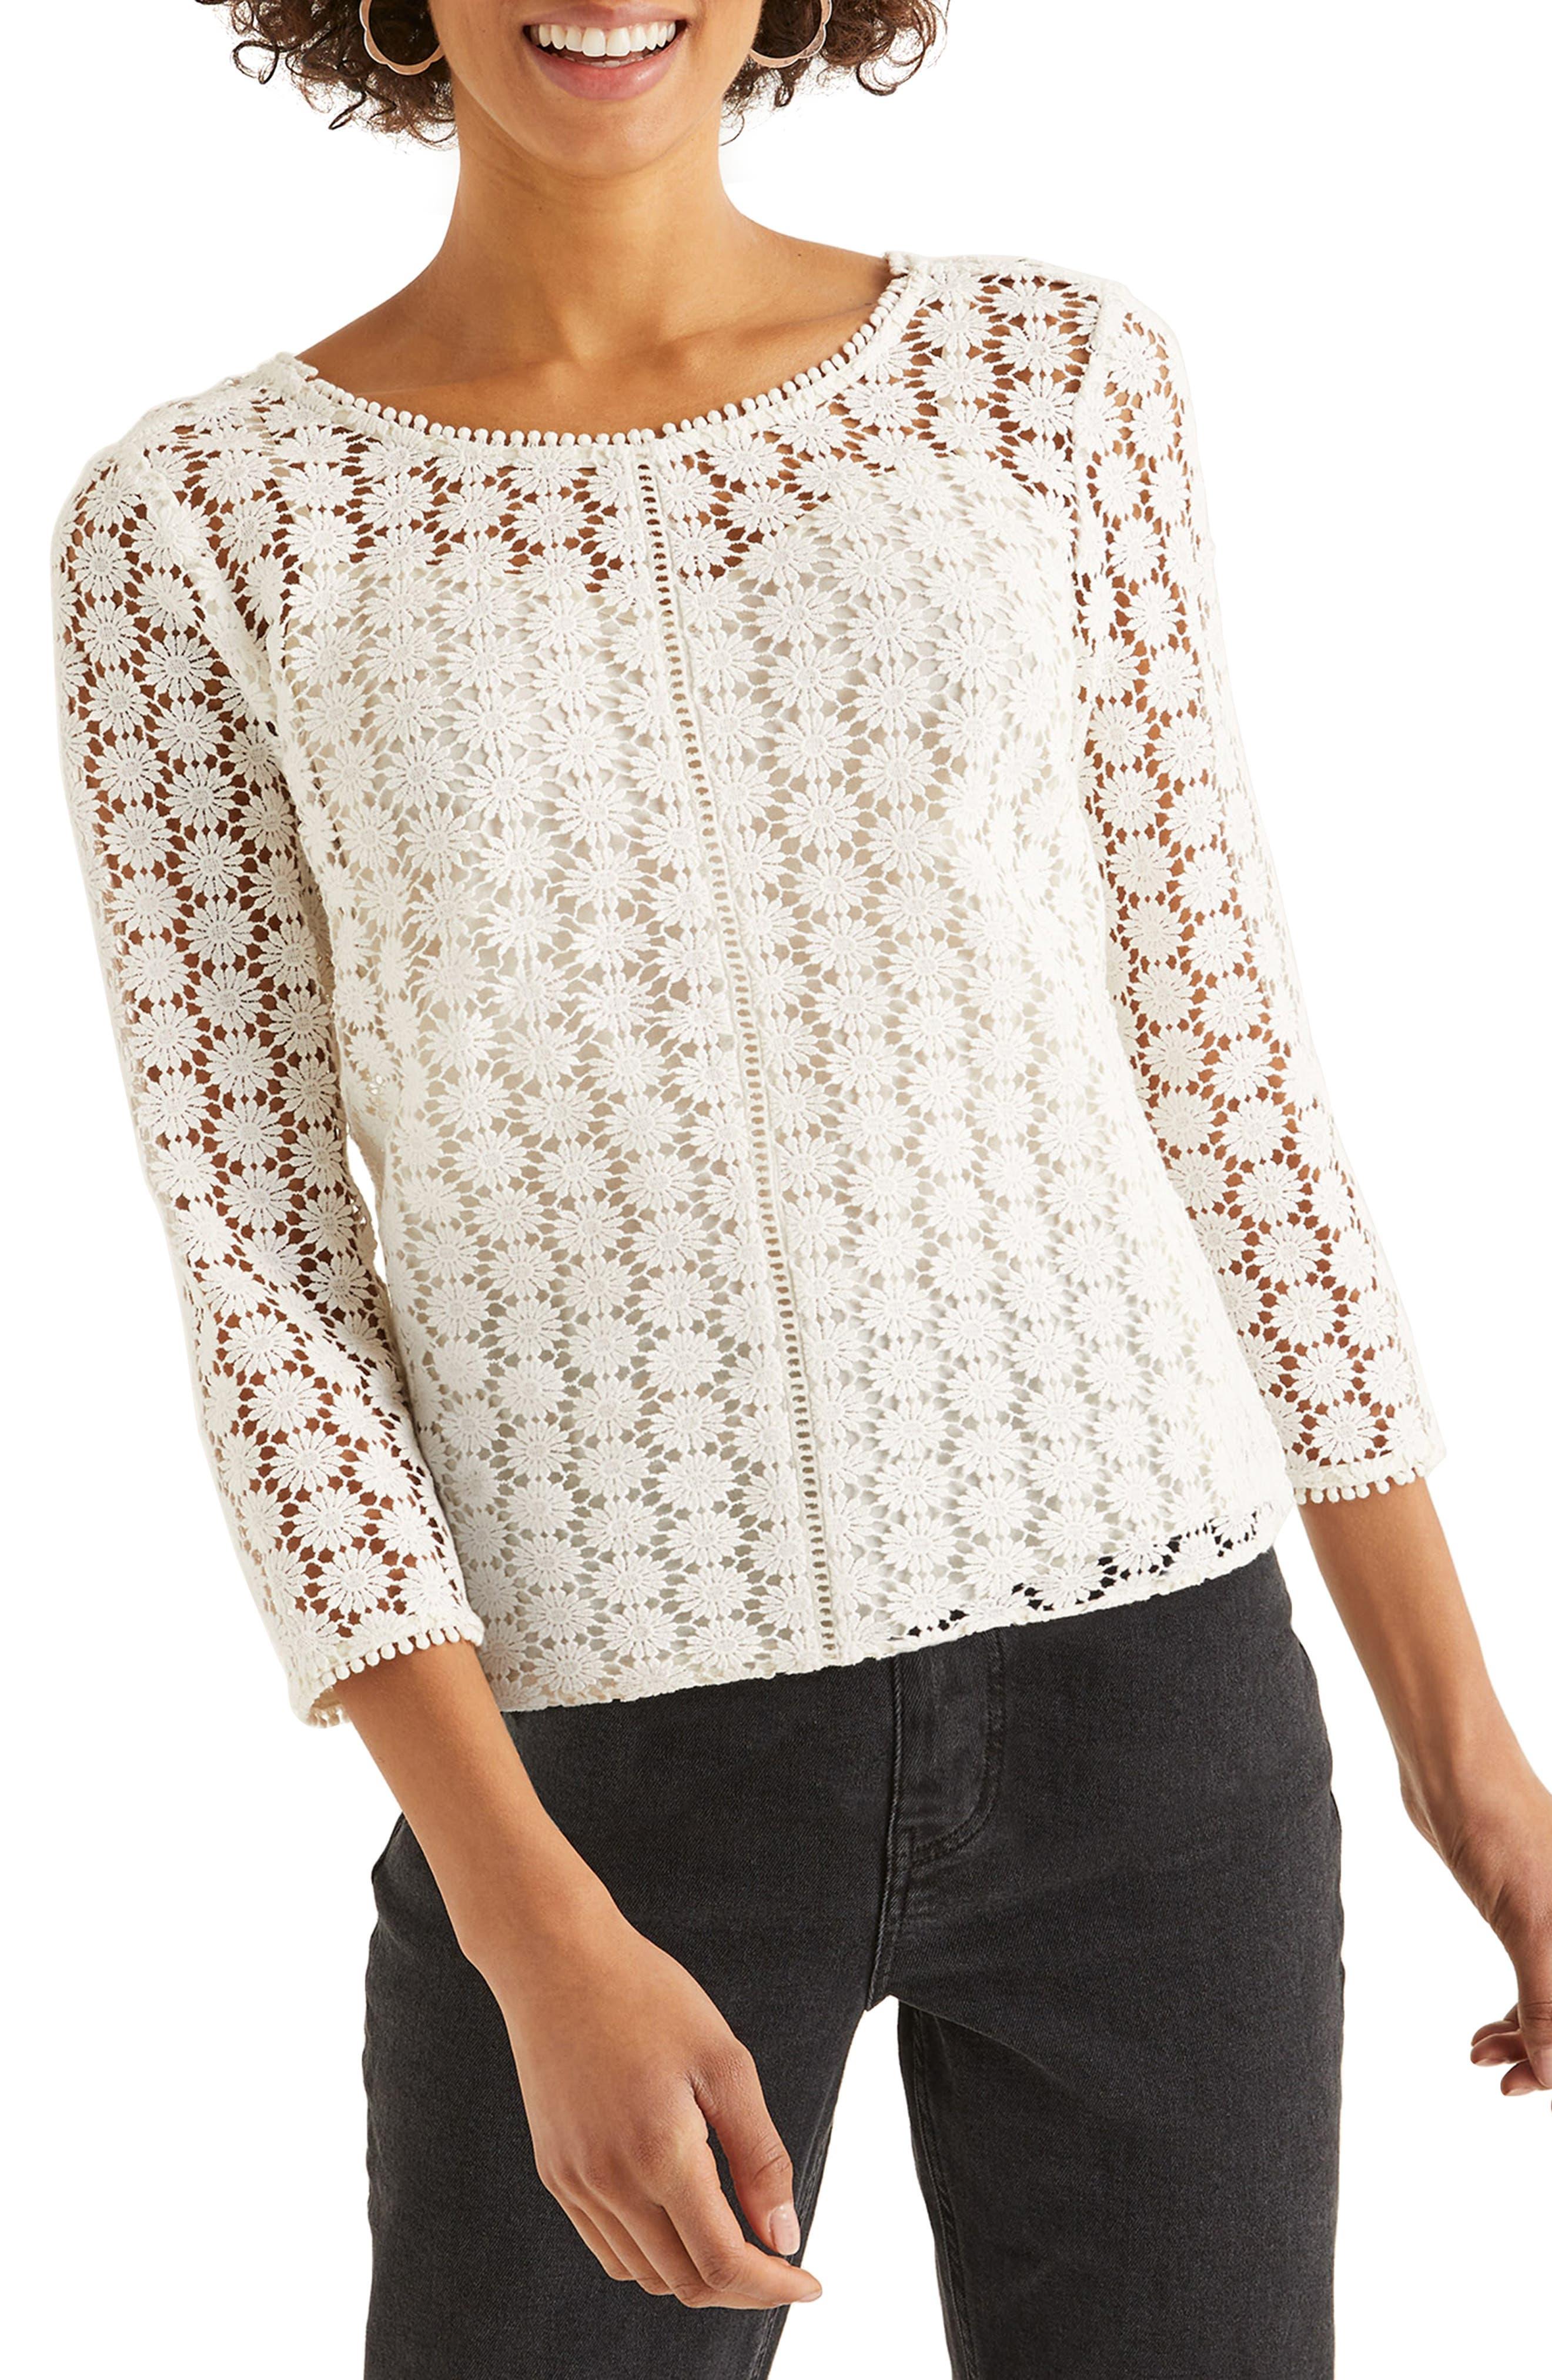 60s Shirts, T-shirt, Blouses, Hippie Shirts Womens Boden Arabella Lace Top Size 4 - Ivory $65.00 AT vintagedancer.com